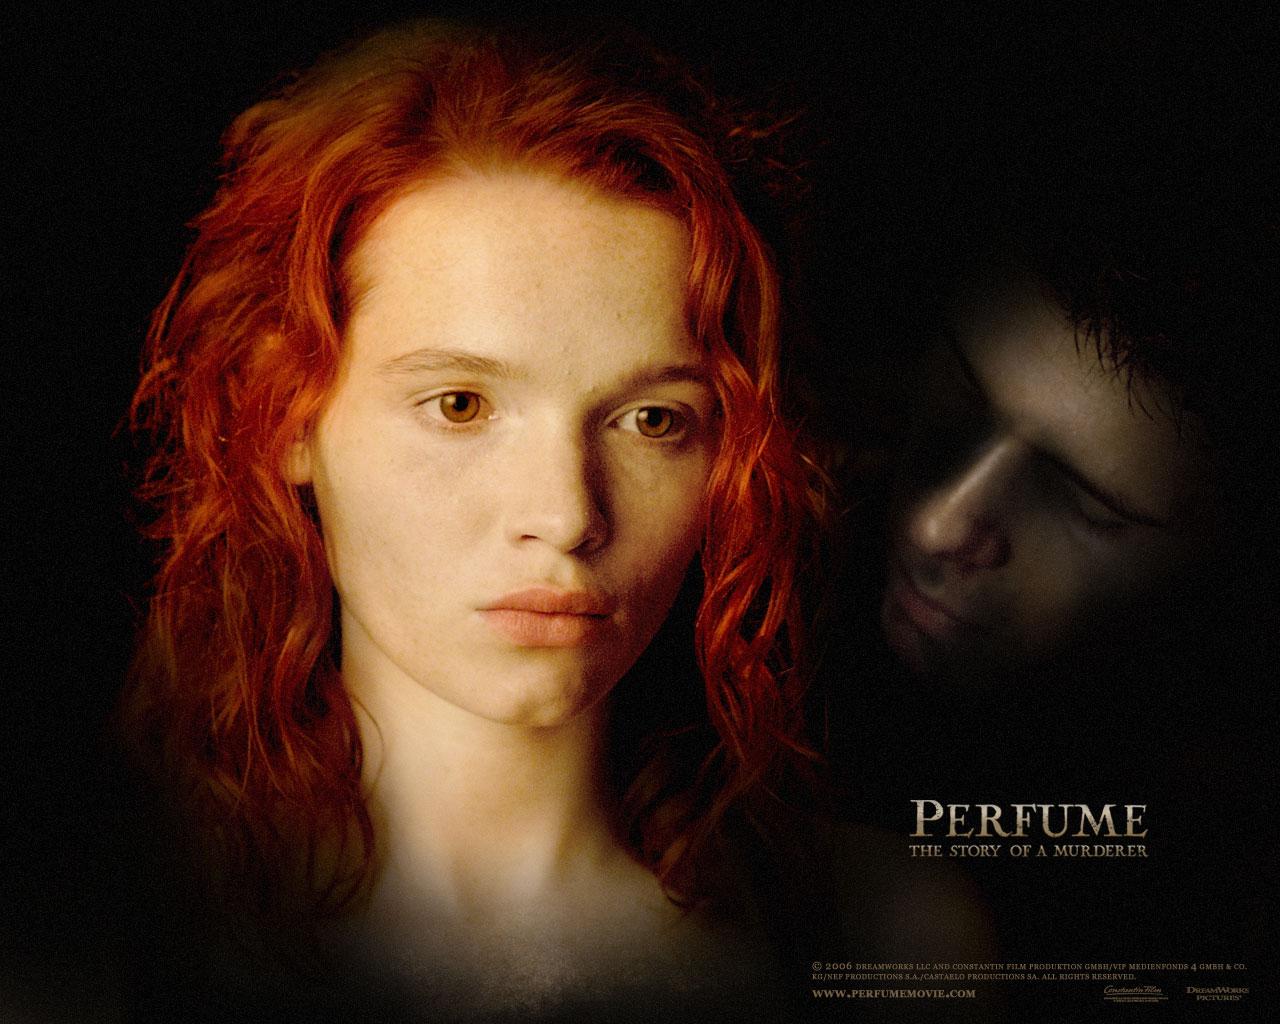 http://1.bp.blogspot.com/-3rky40dYi90/T6usZ-K01YI/AAAAAAAAAXA/L9fR1yA-IUU/s1600/perfume+the+story+of+a+murderer.jpg